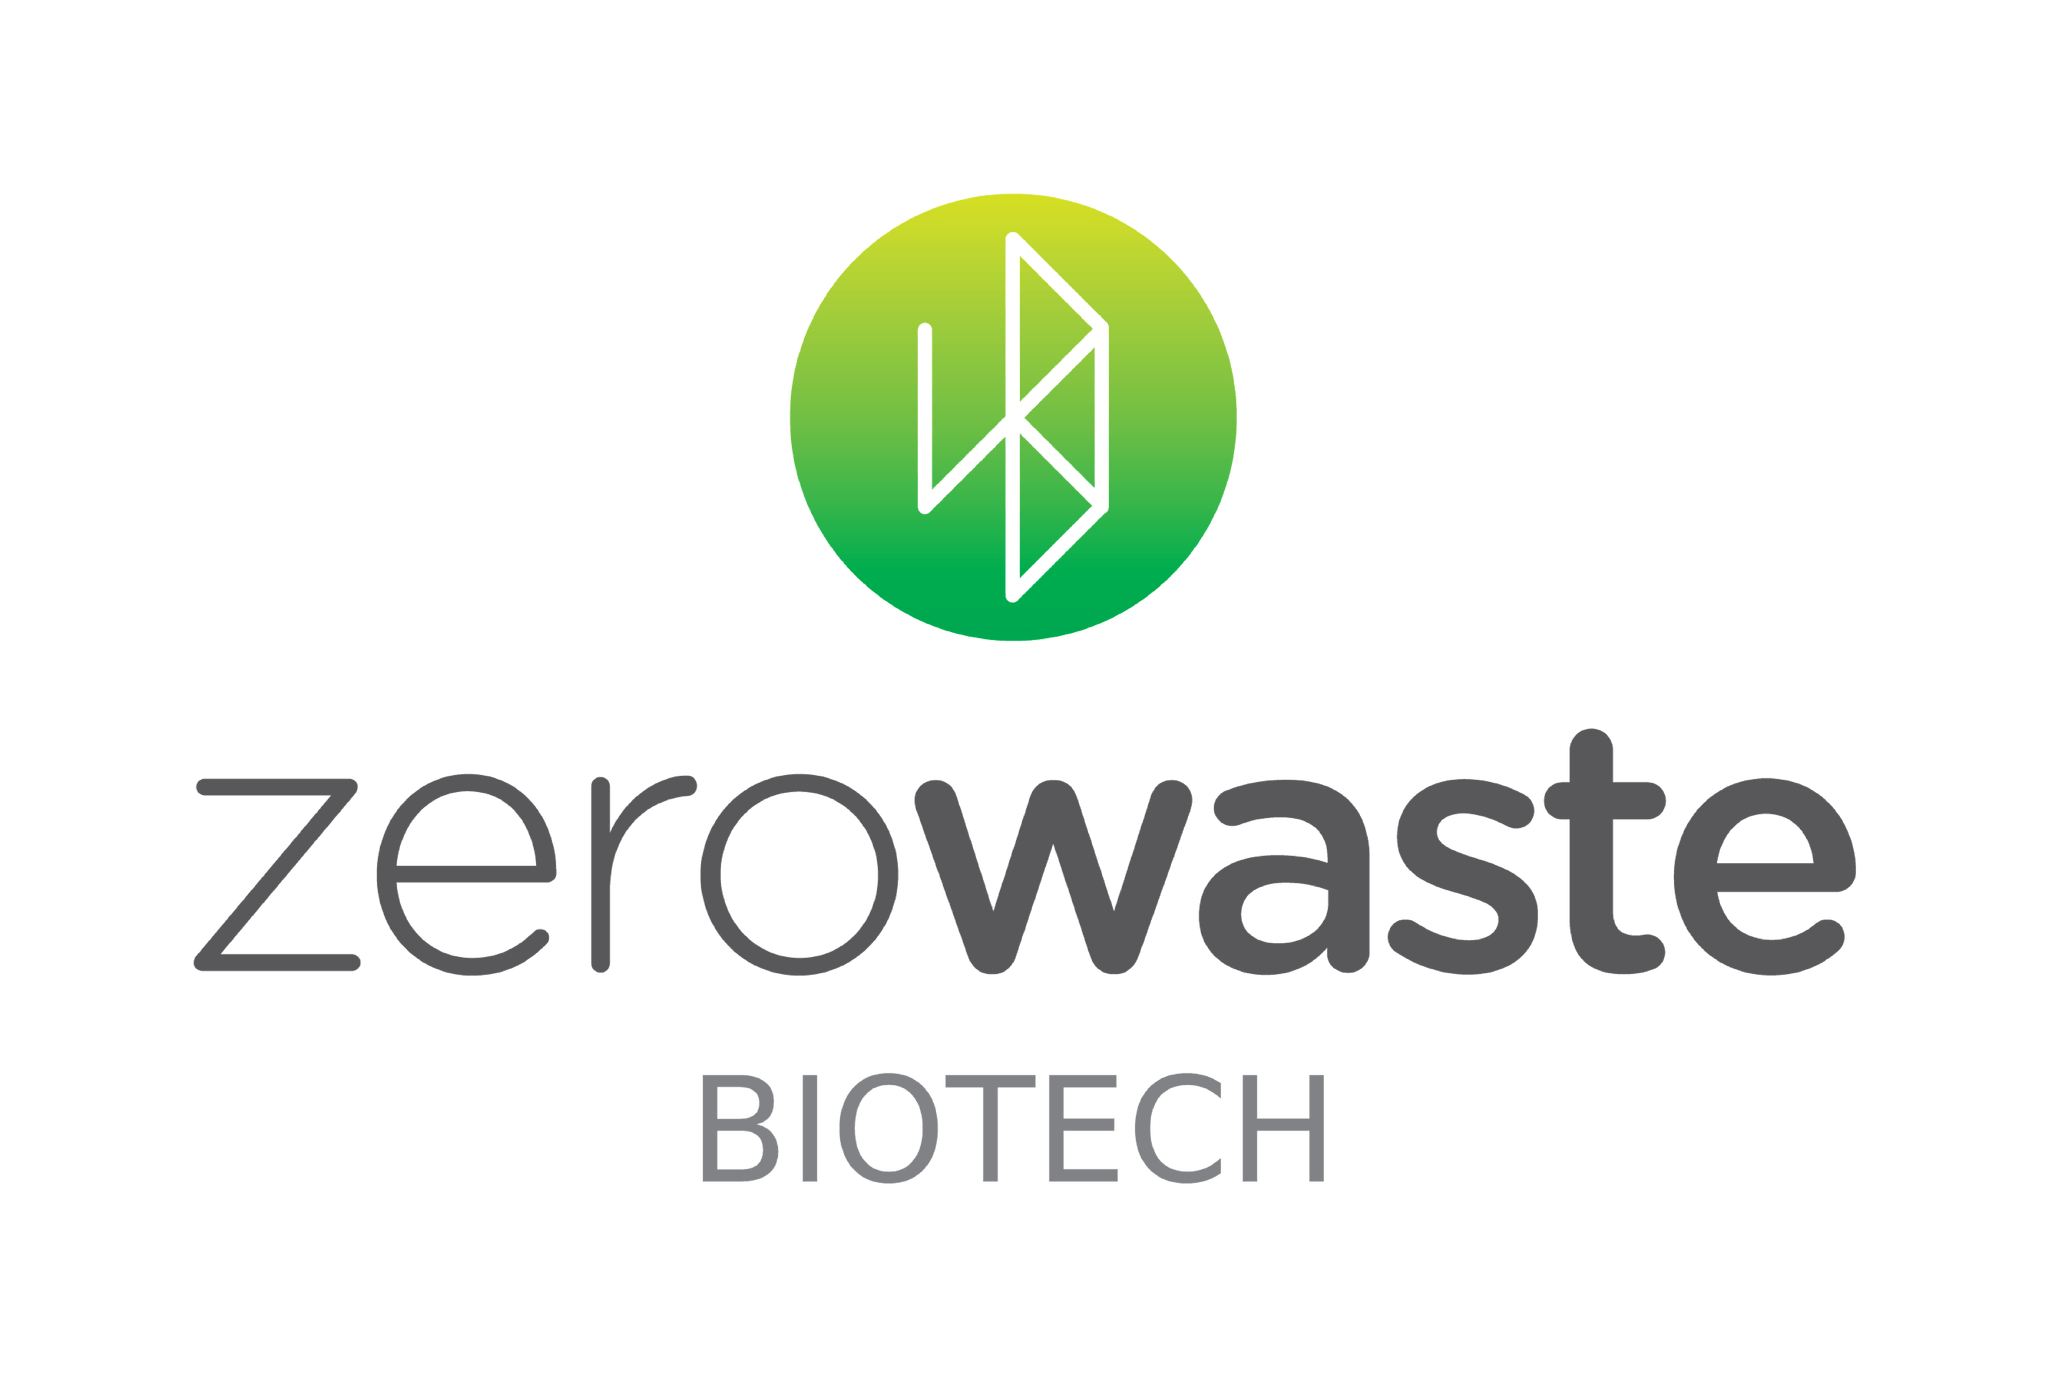 Zero Waste Biotech limited